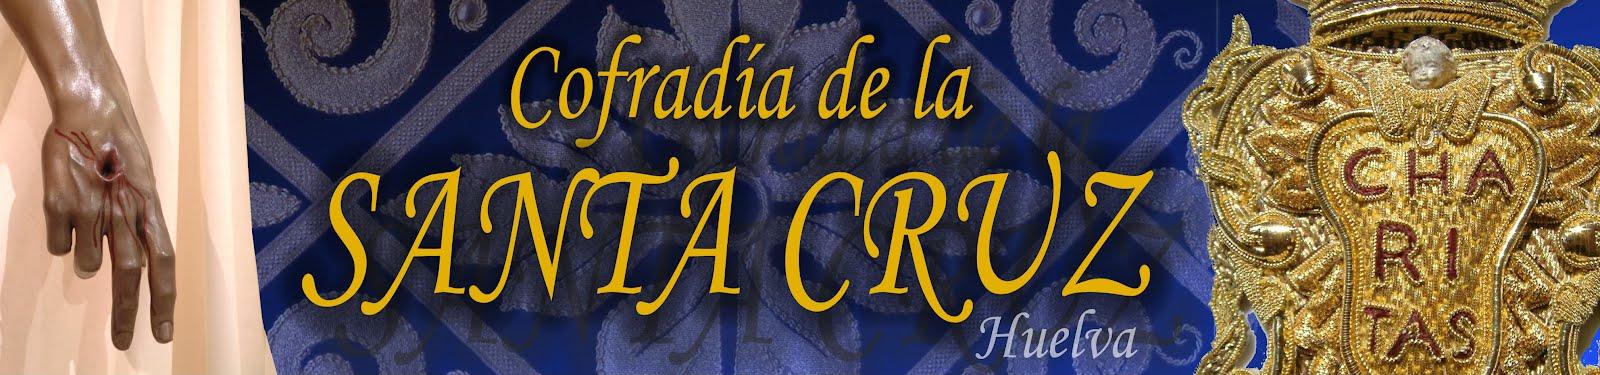 Cofradía de la Santa Cruz-Huelva